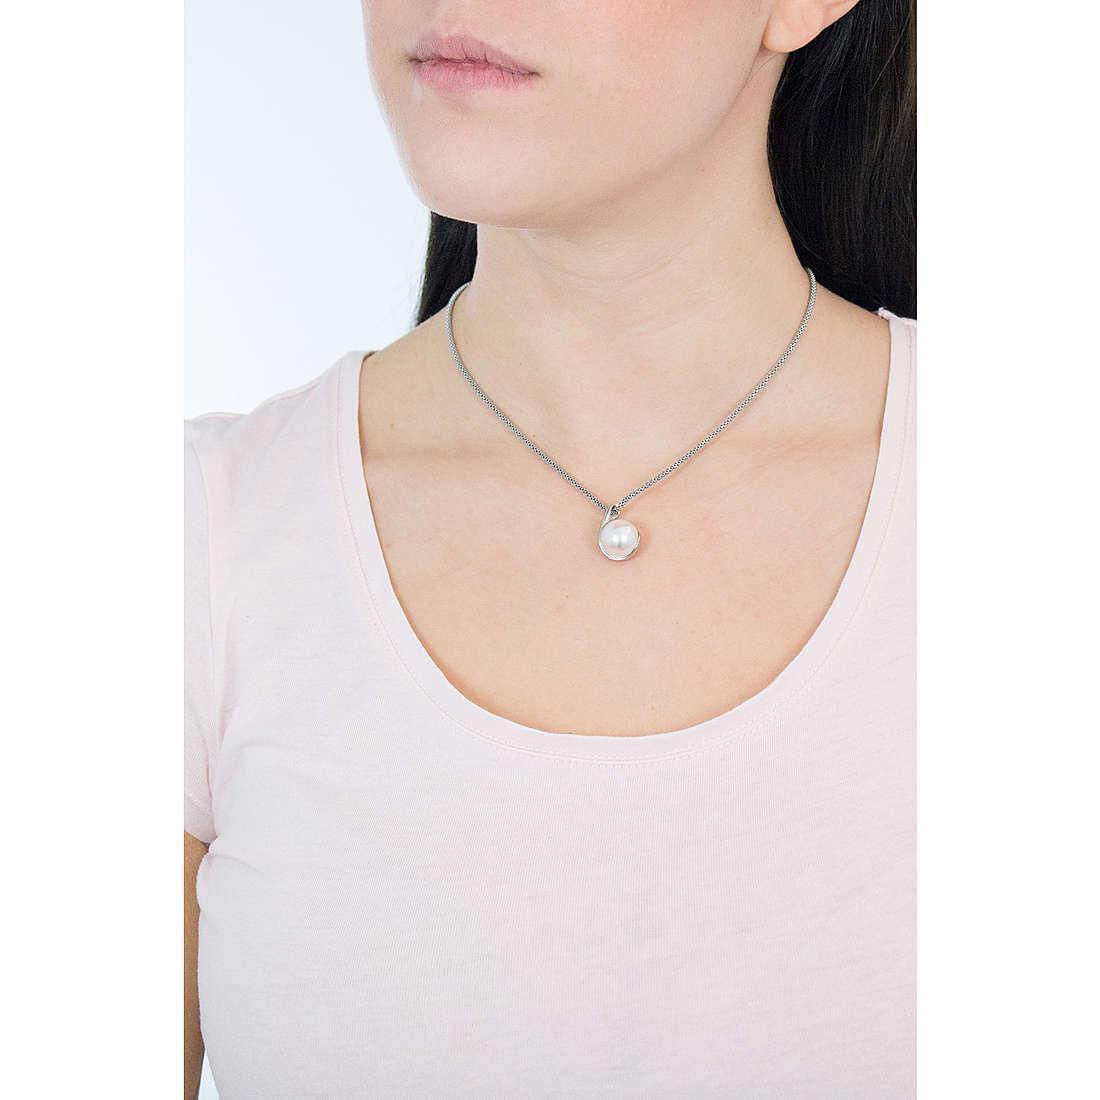 Skagen necklaces Spring 2013 woman SKJ0089040 photo wearing